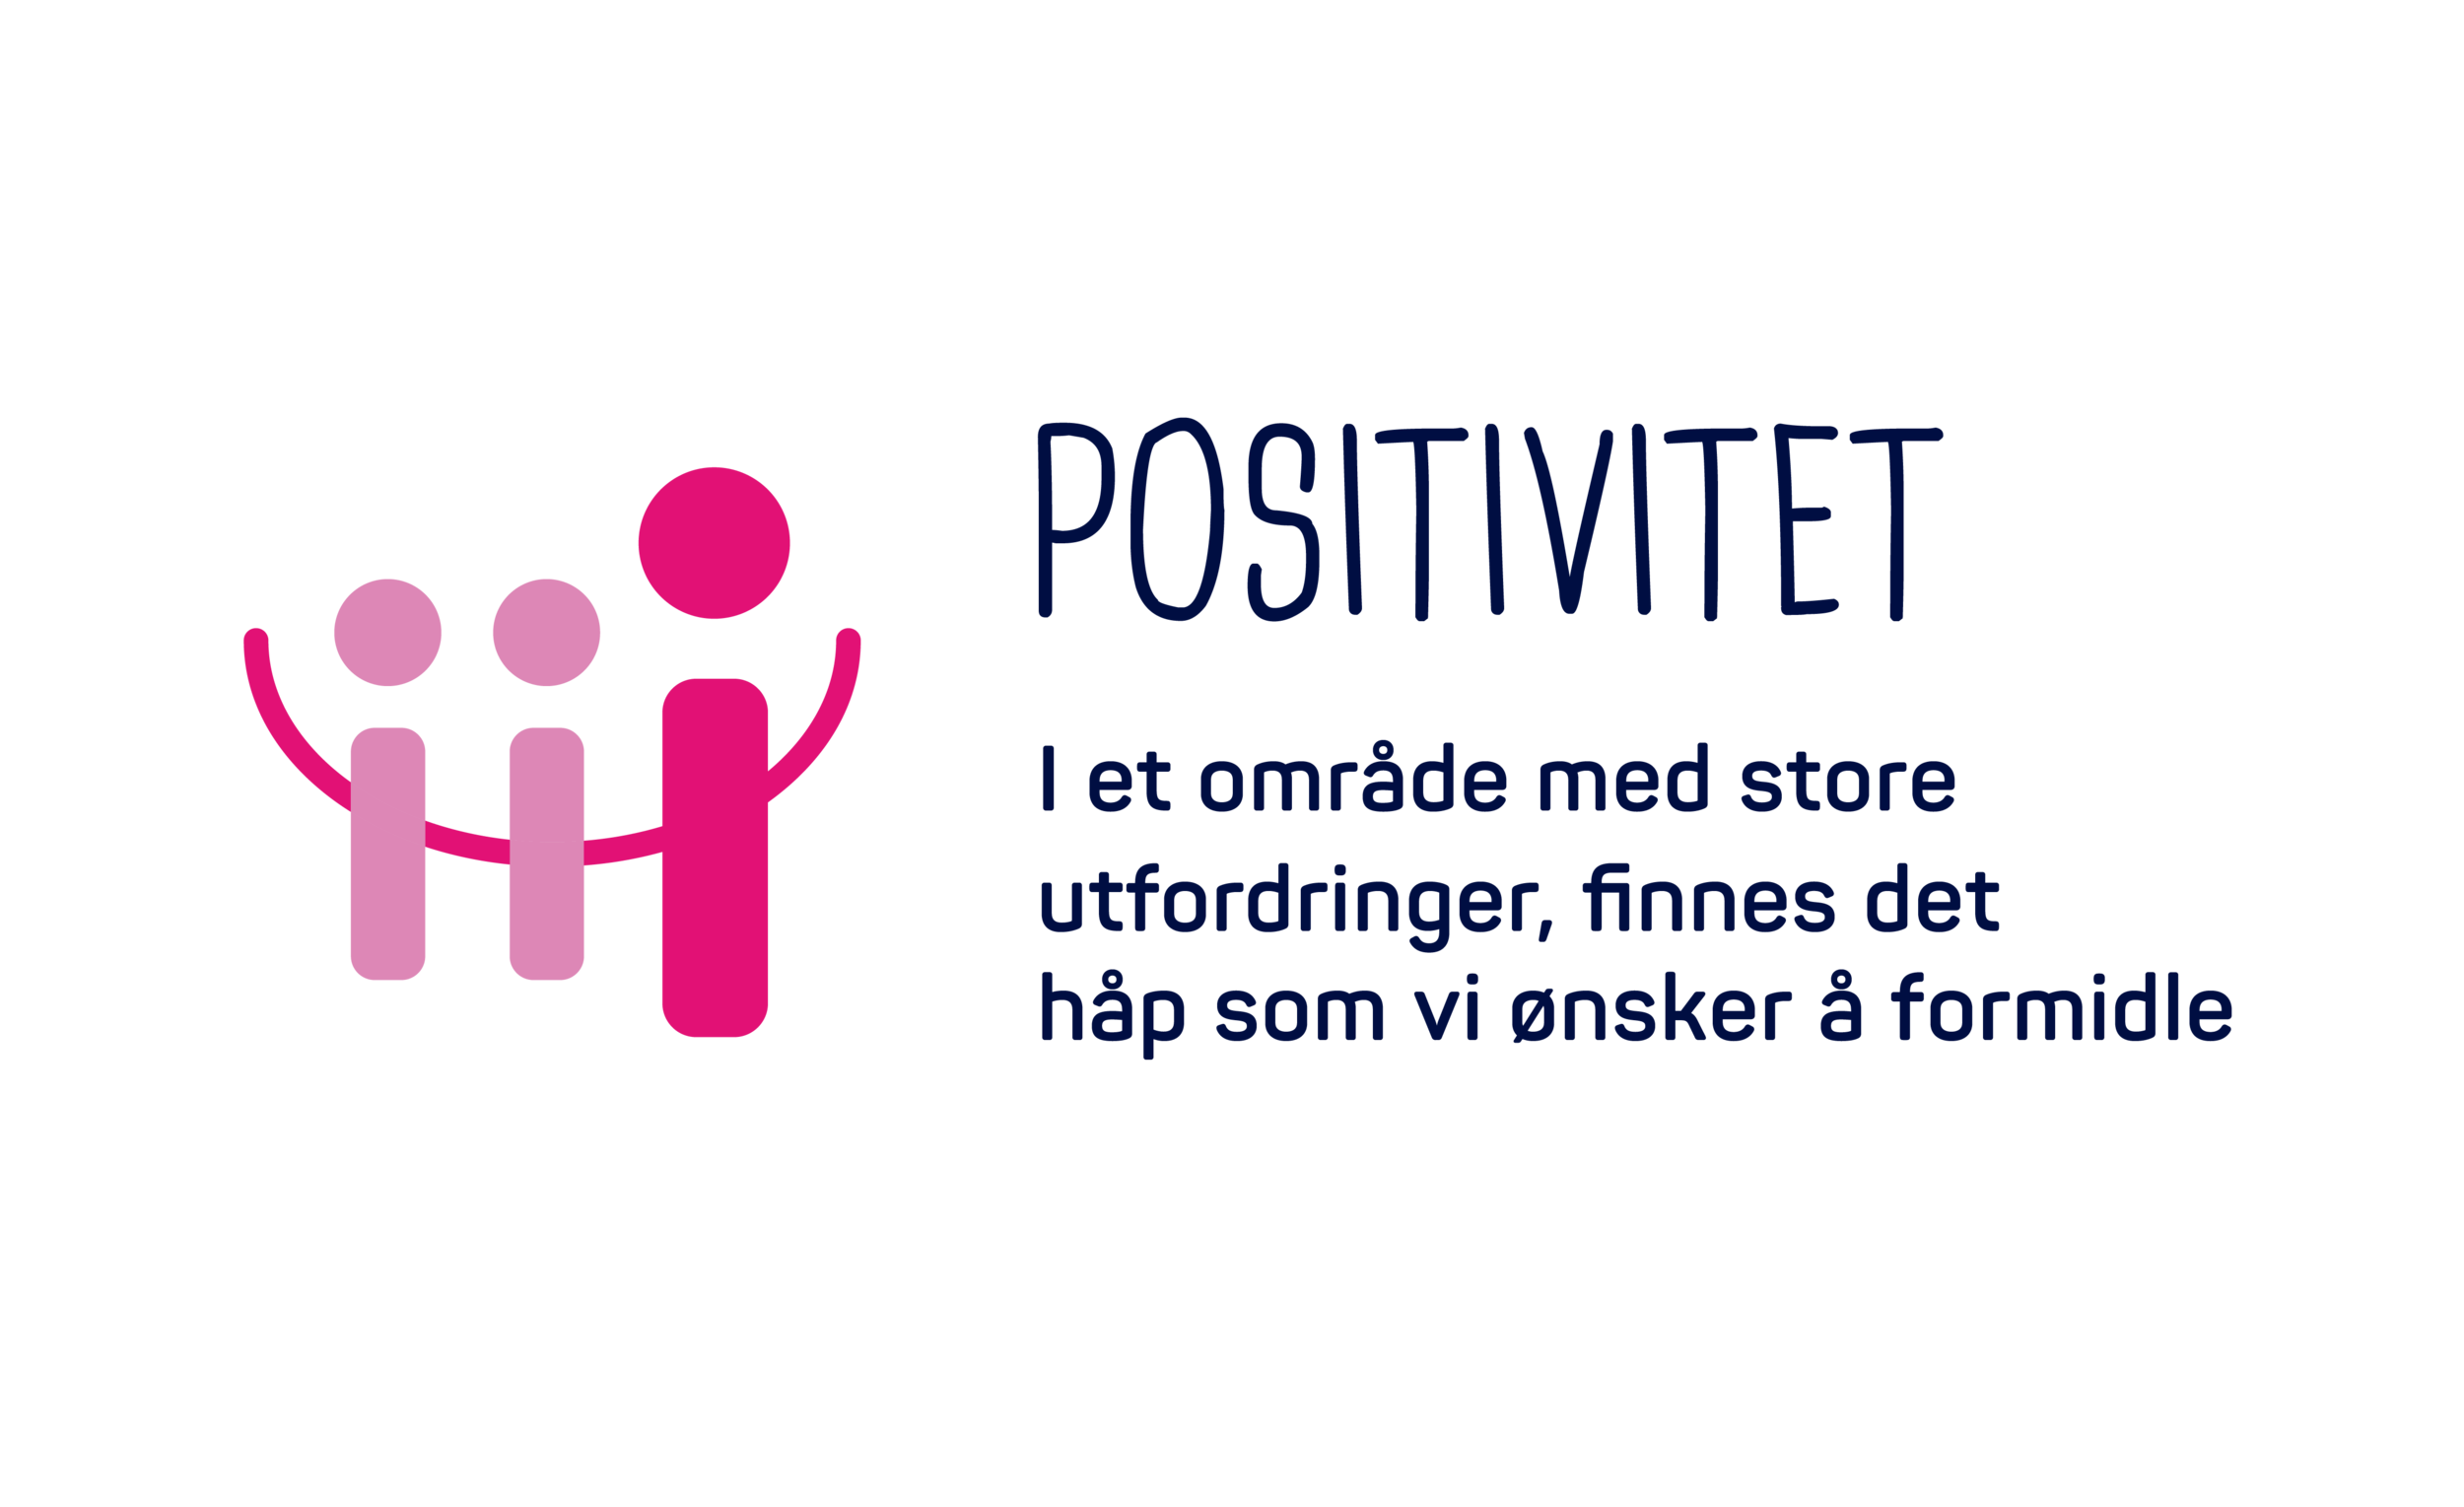 VERDIIKONER_Positivitet-23.png